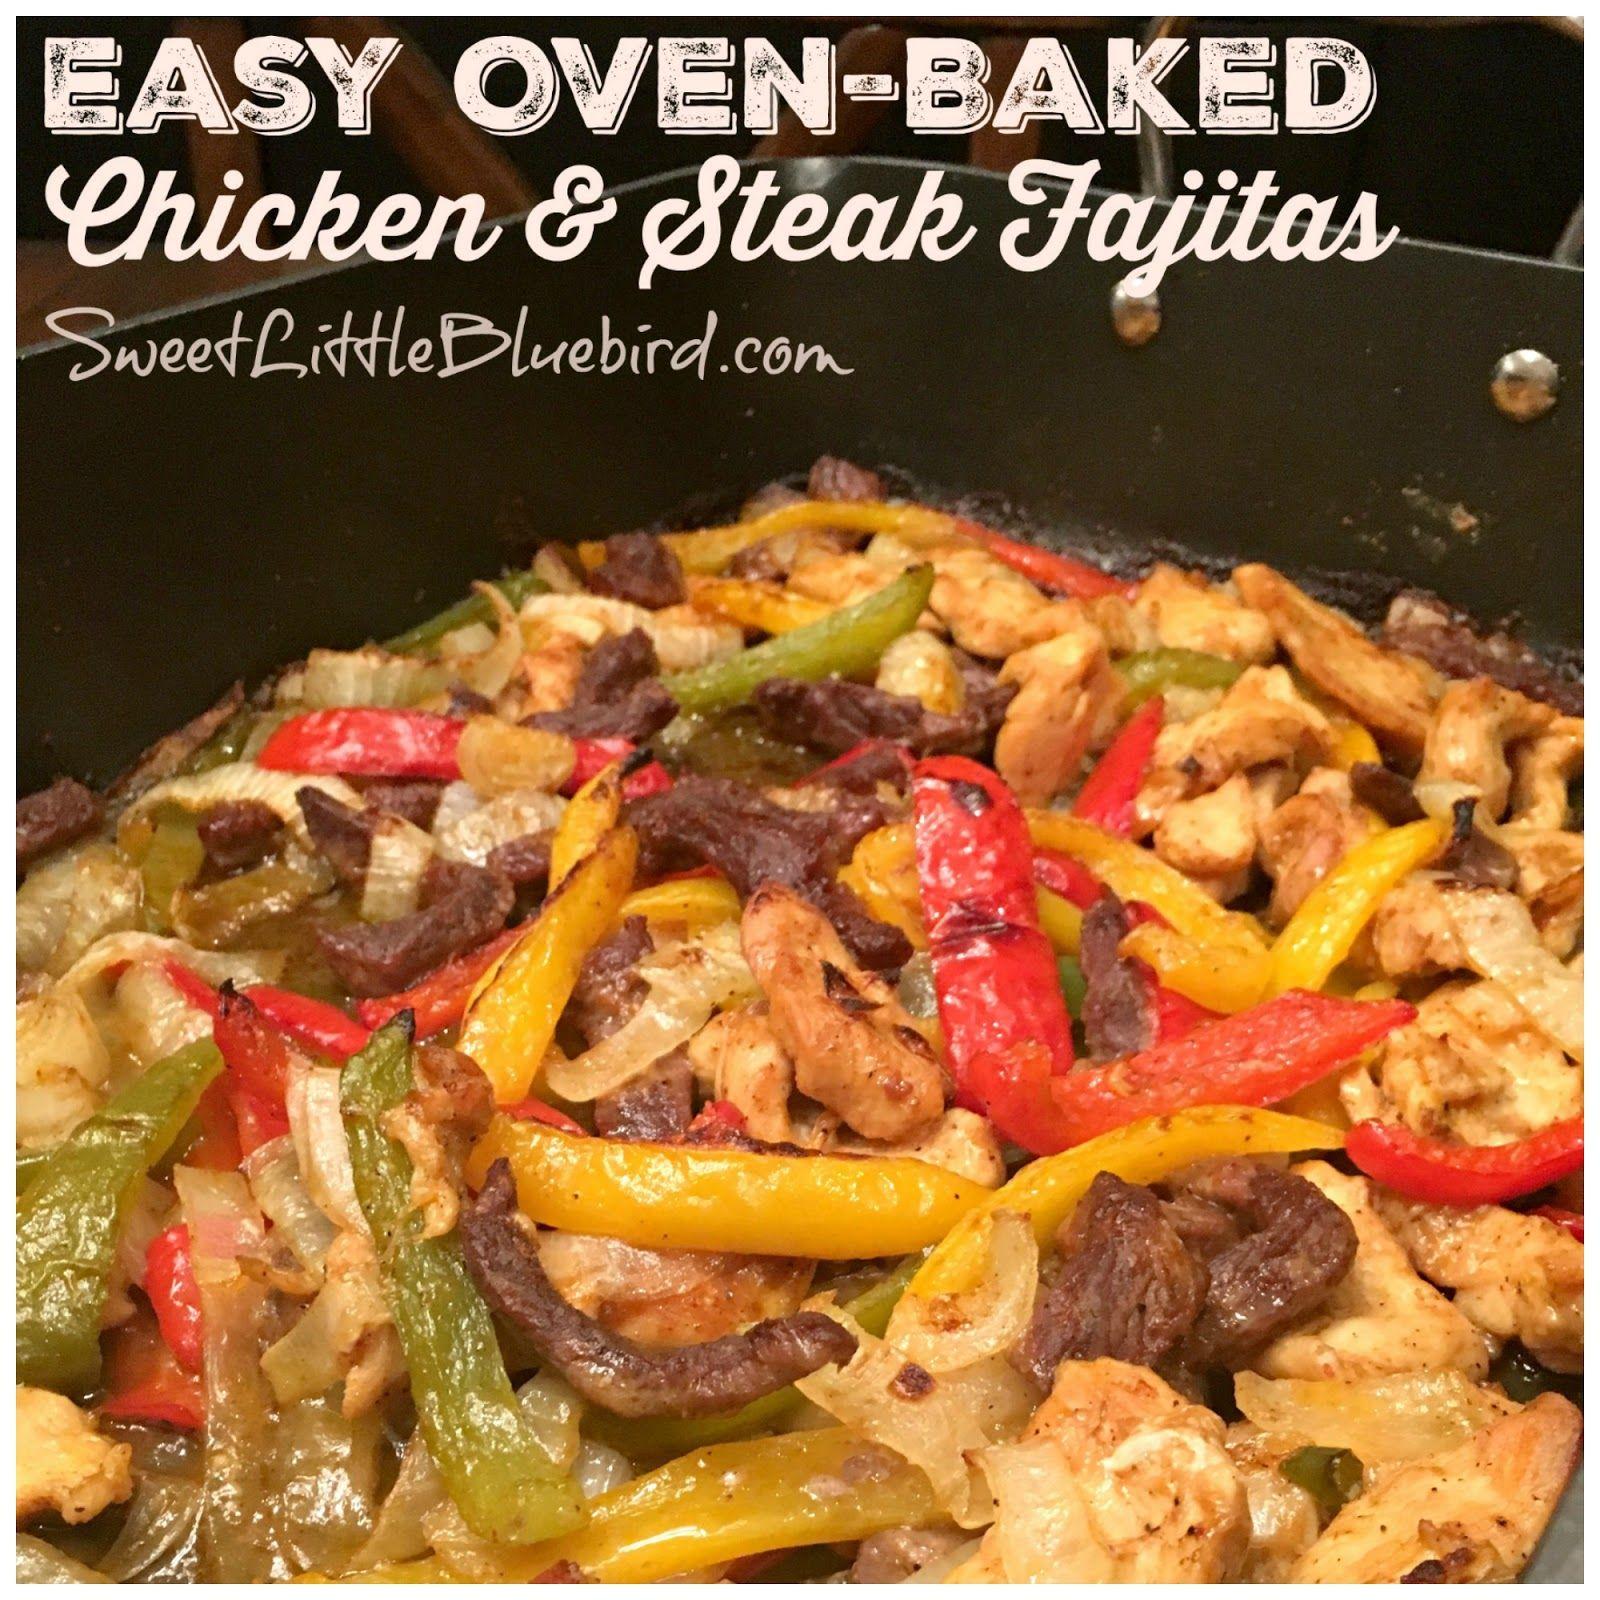 Chicken Fajitas Lettuce Wraps Oven Baked! Little Broken #beeffajitarecipe